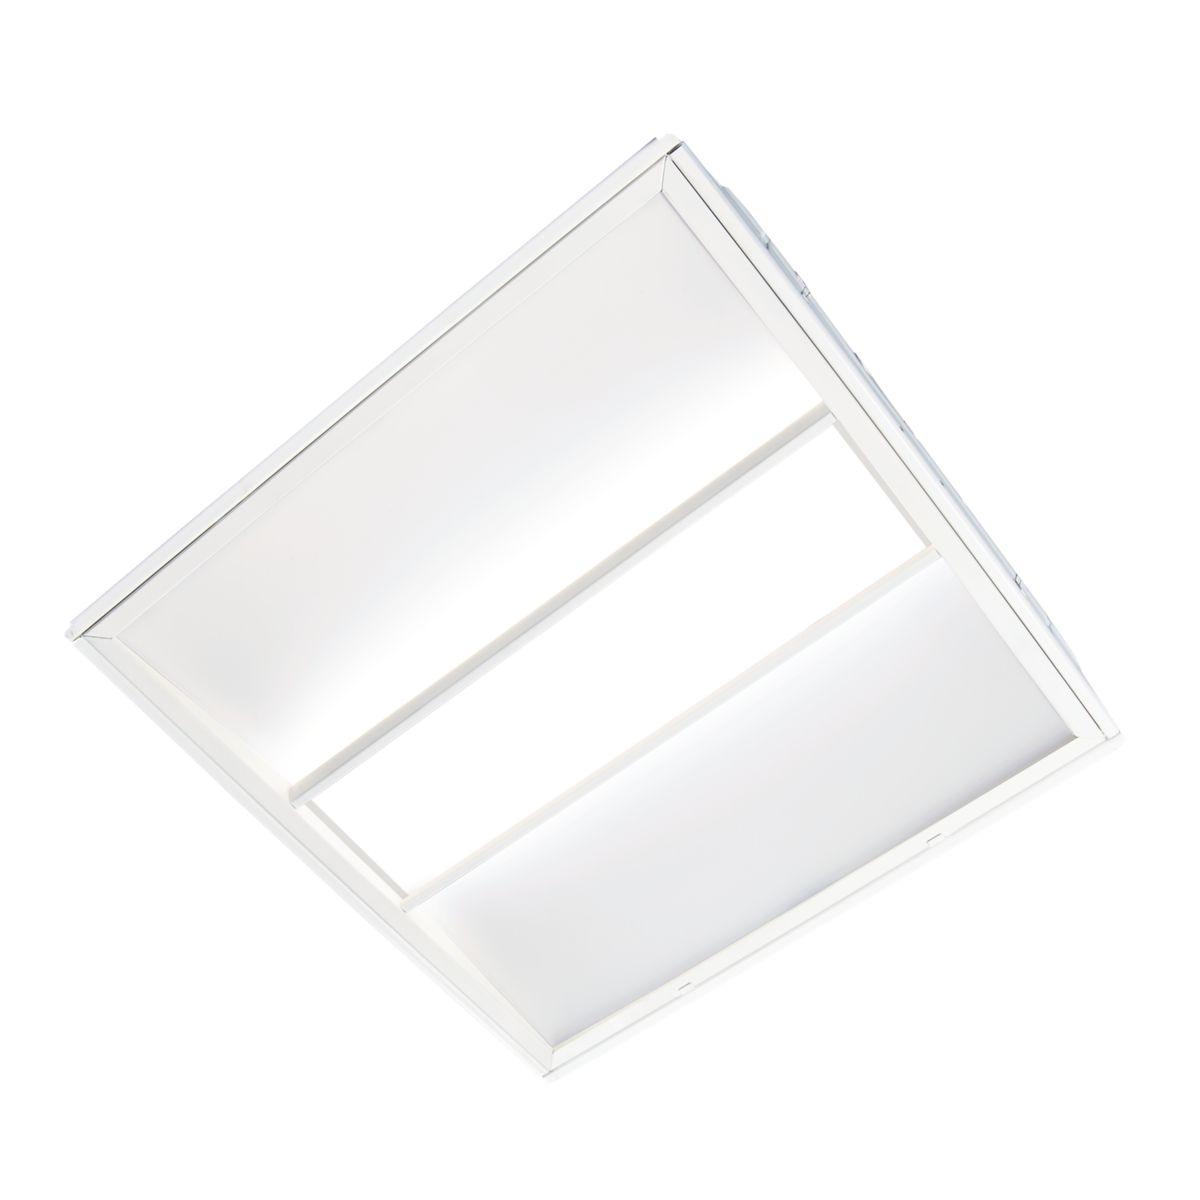 RLN LED Series